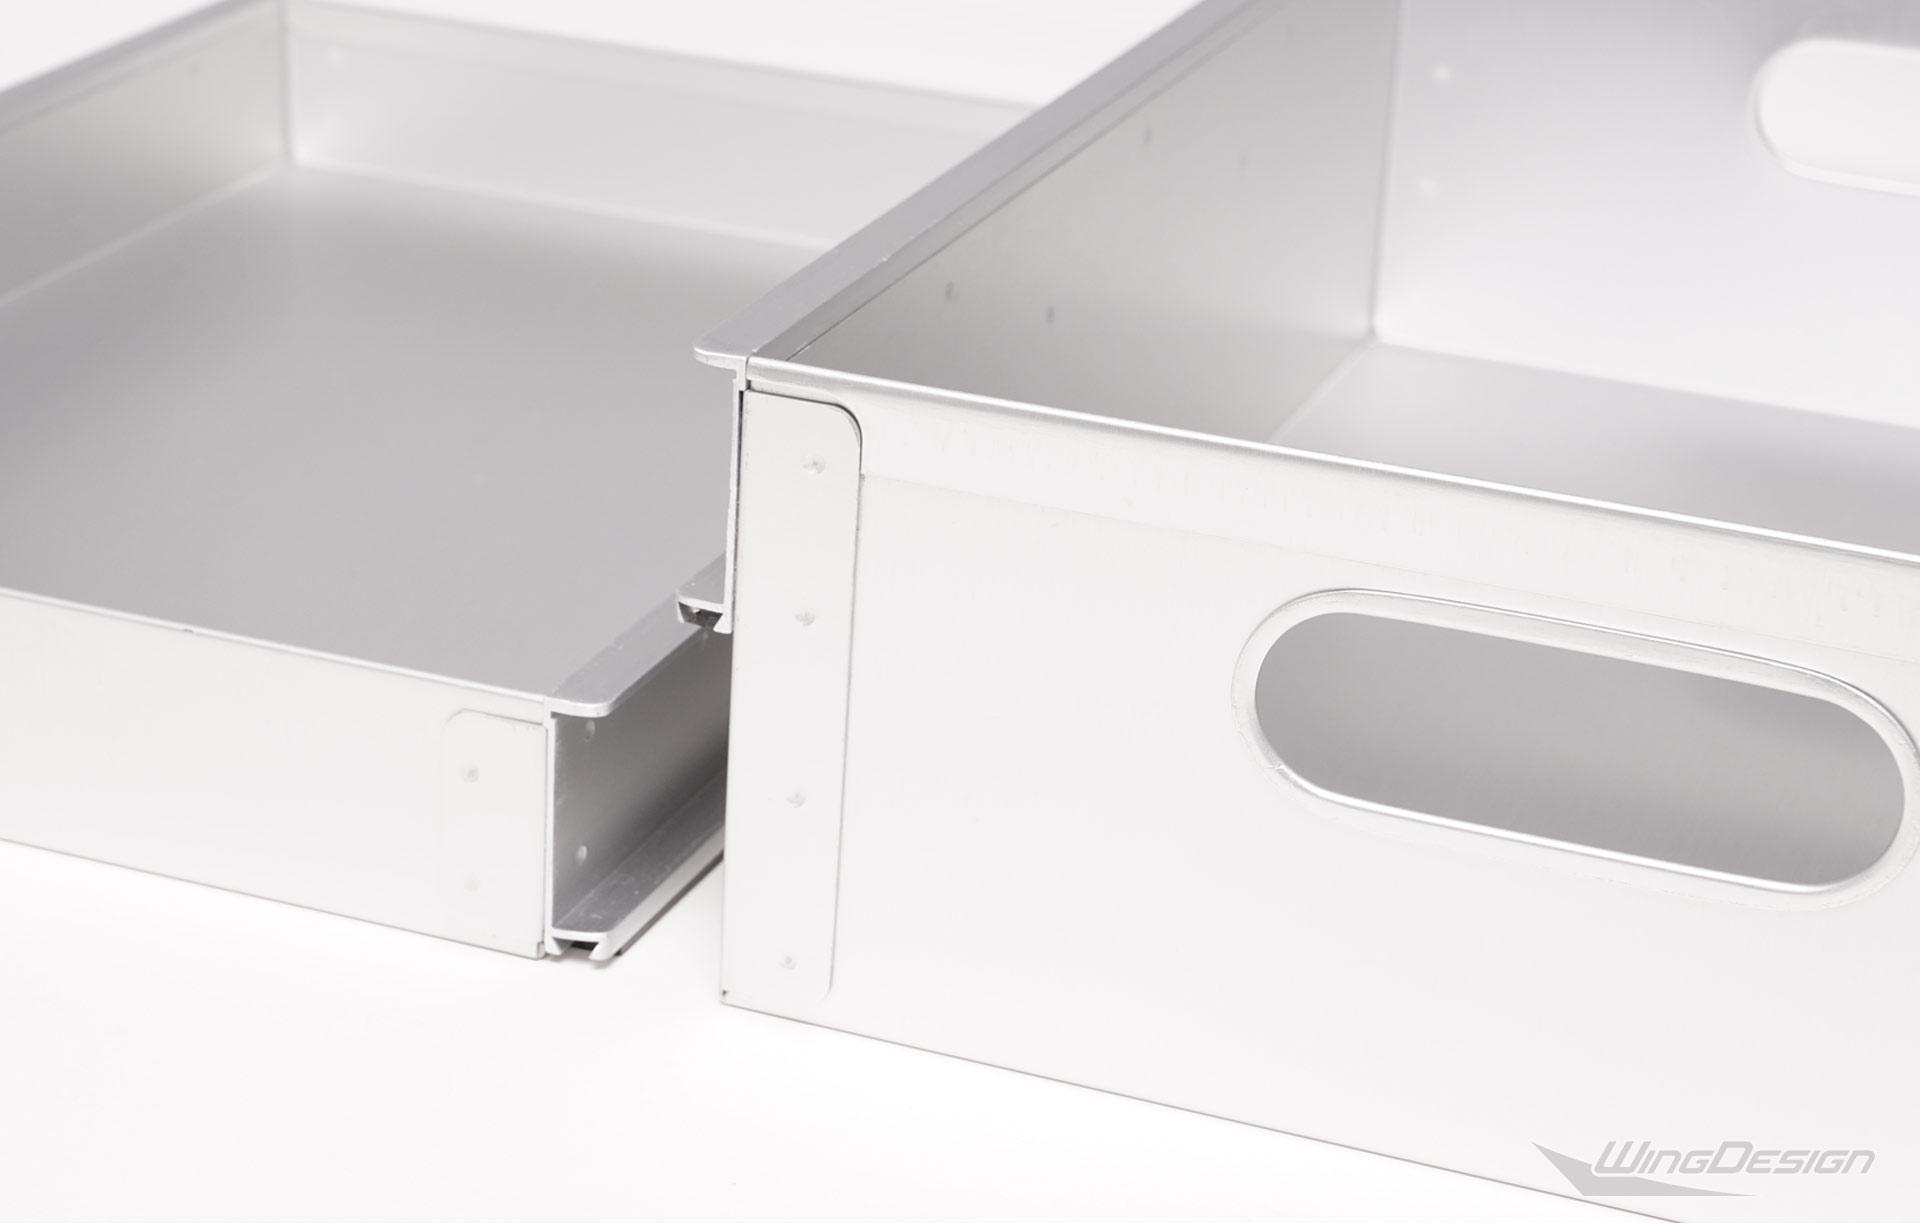 Flugzeugtrolley neu Aluminium Zubehoer